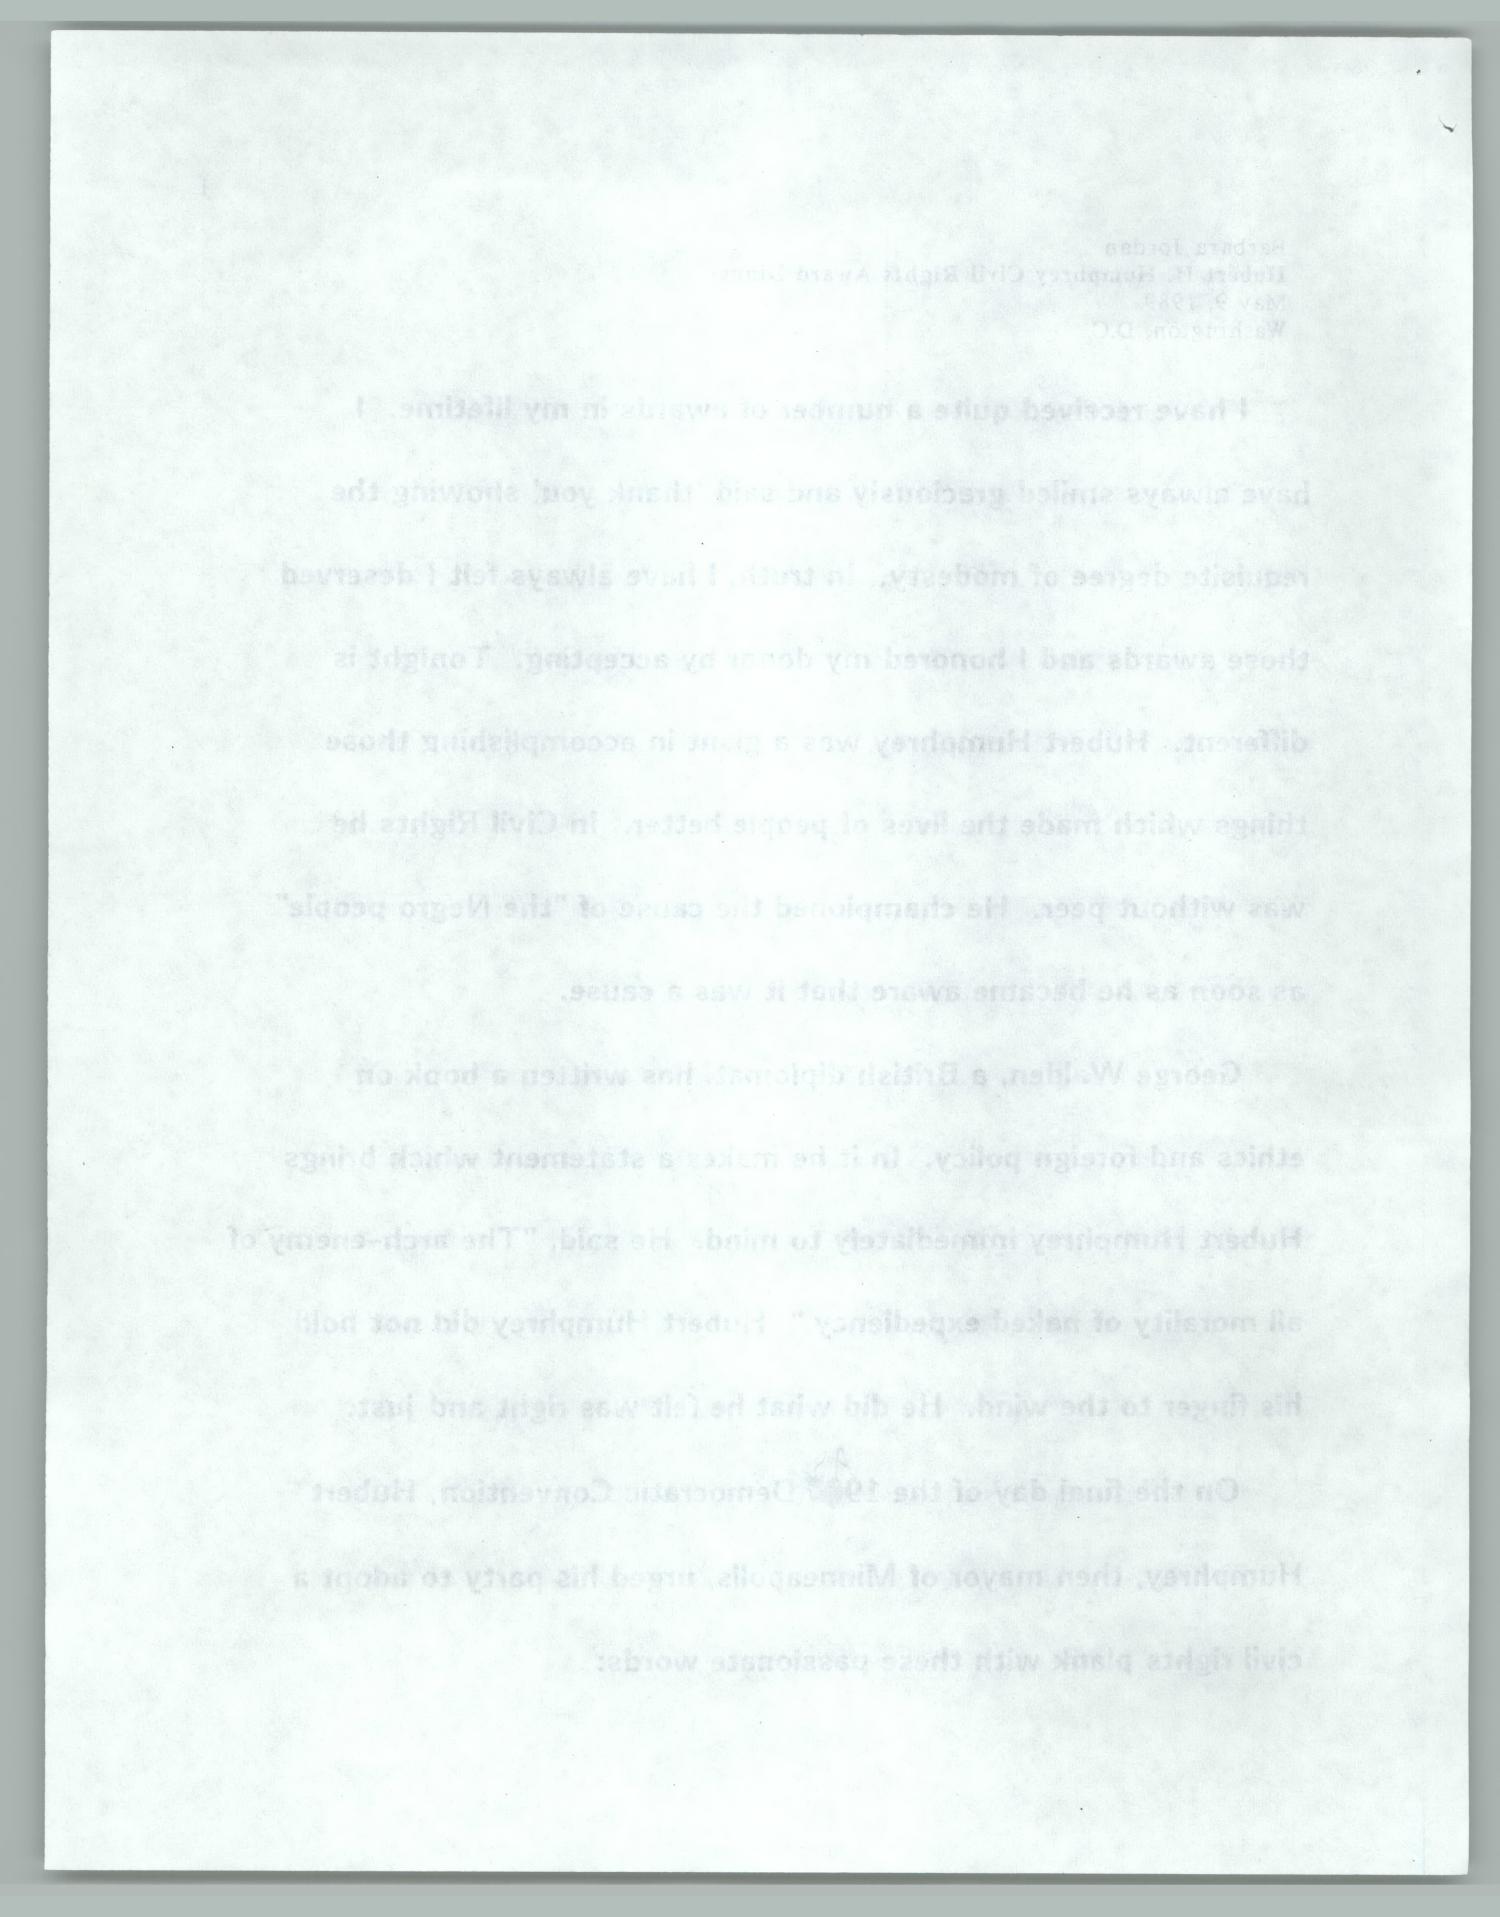 [Barbara Jordan Acceptance Speech at Hubert H. Humphrey